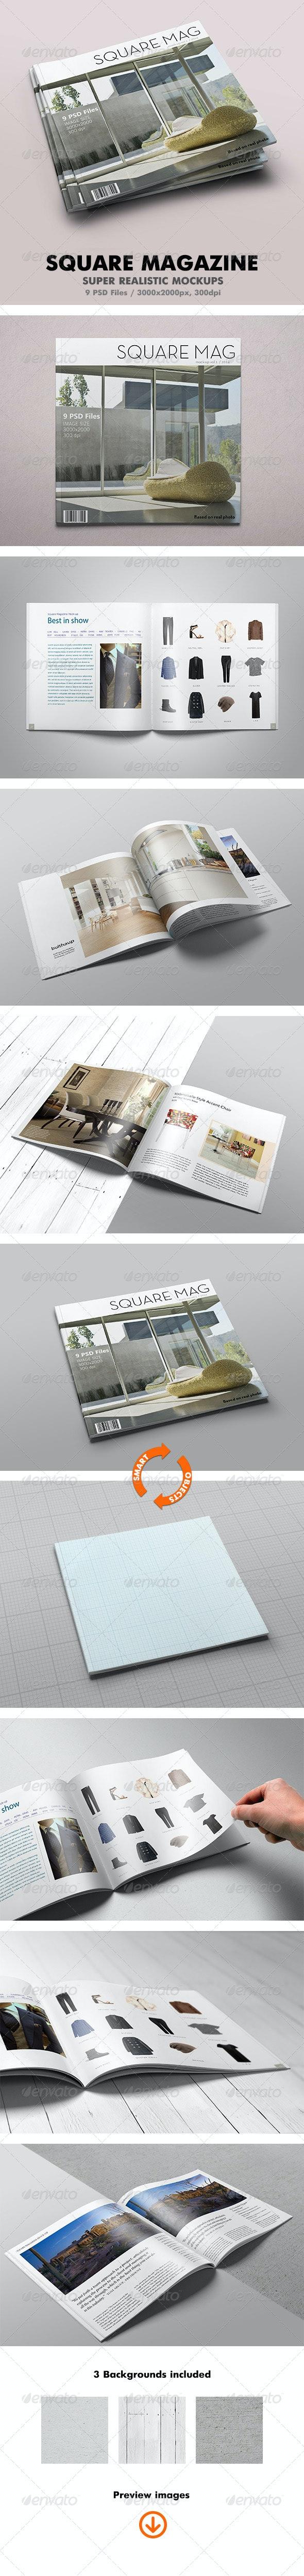 Square Magazine Mock-Up - Magazines Print